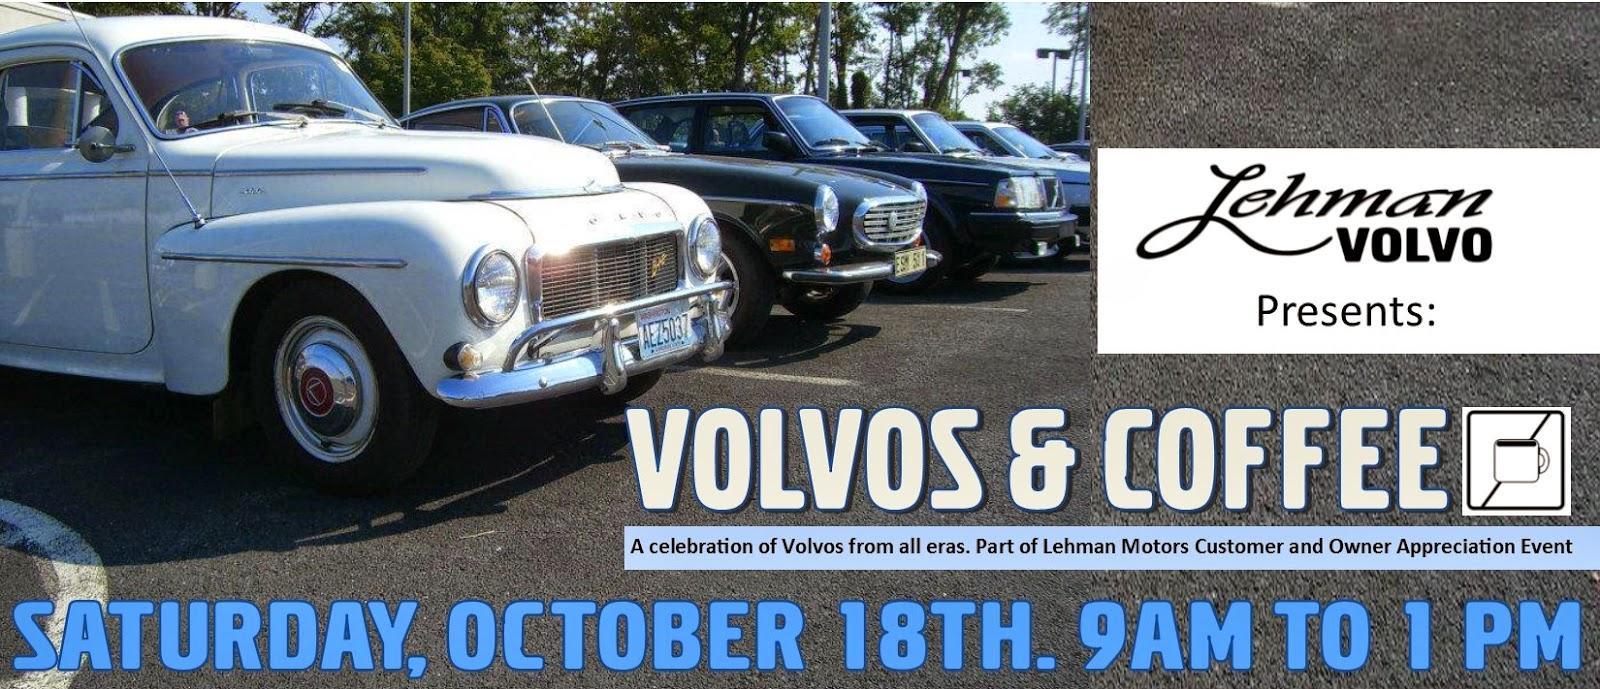 Lehman Volvo Cars Tis The Season ForFall Volvo Shows - Car show york pa